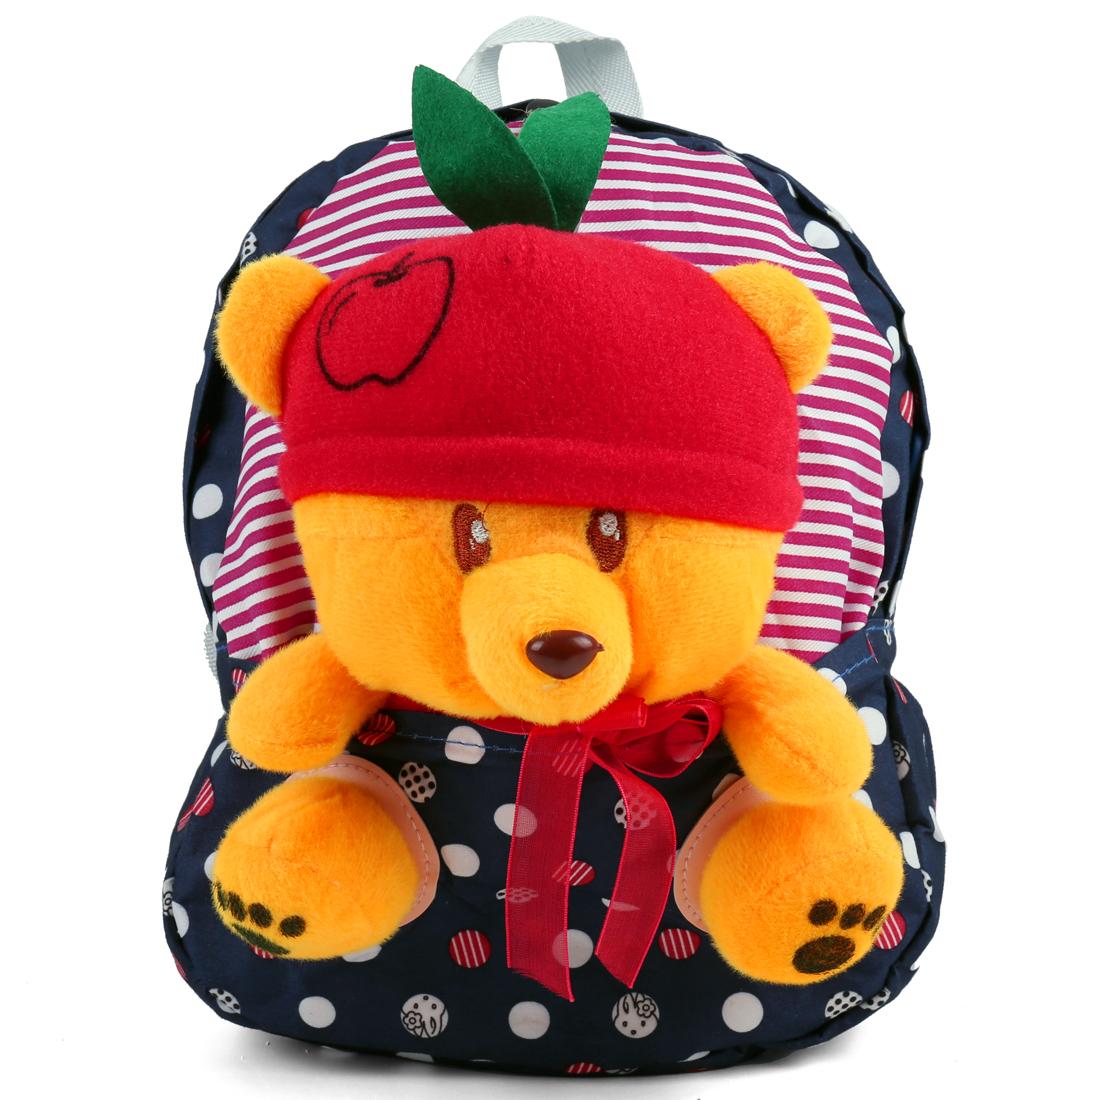 Kids Buckle Straps Zip Up Splice Solid Bear Backpacks Navy Blue Yellow